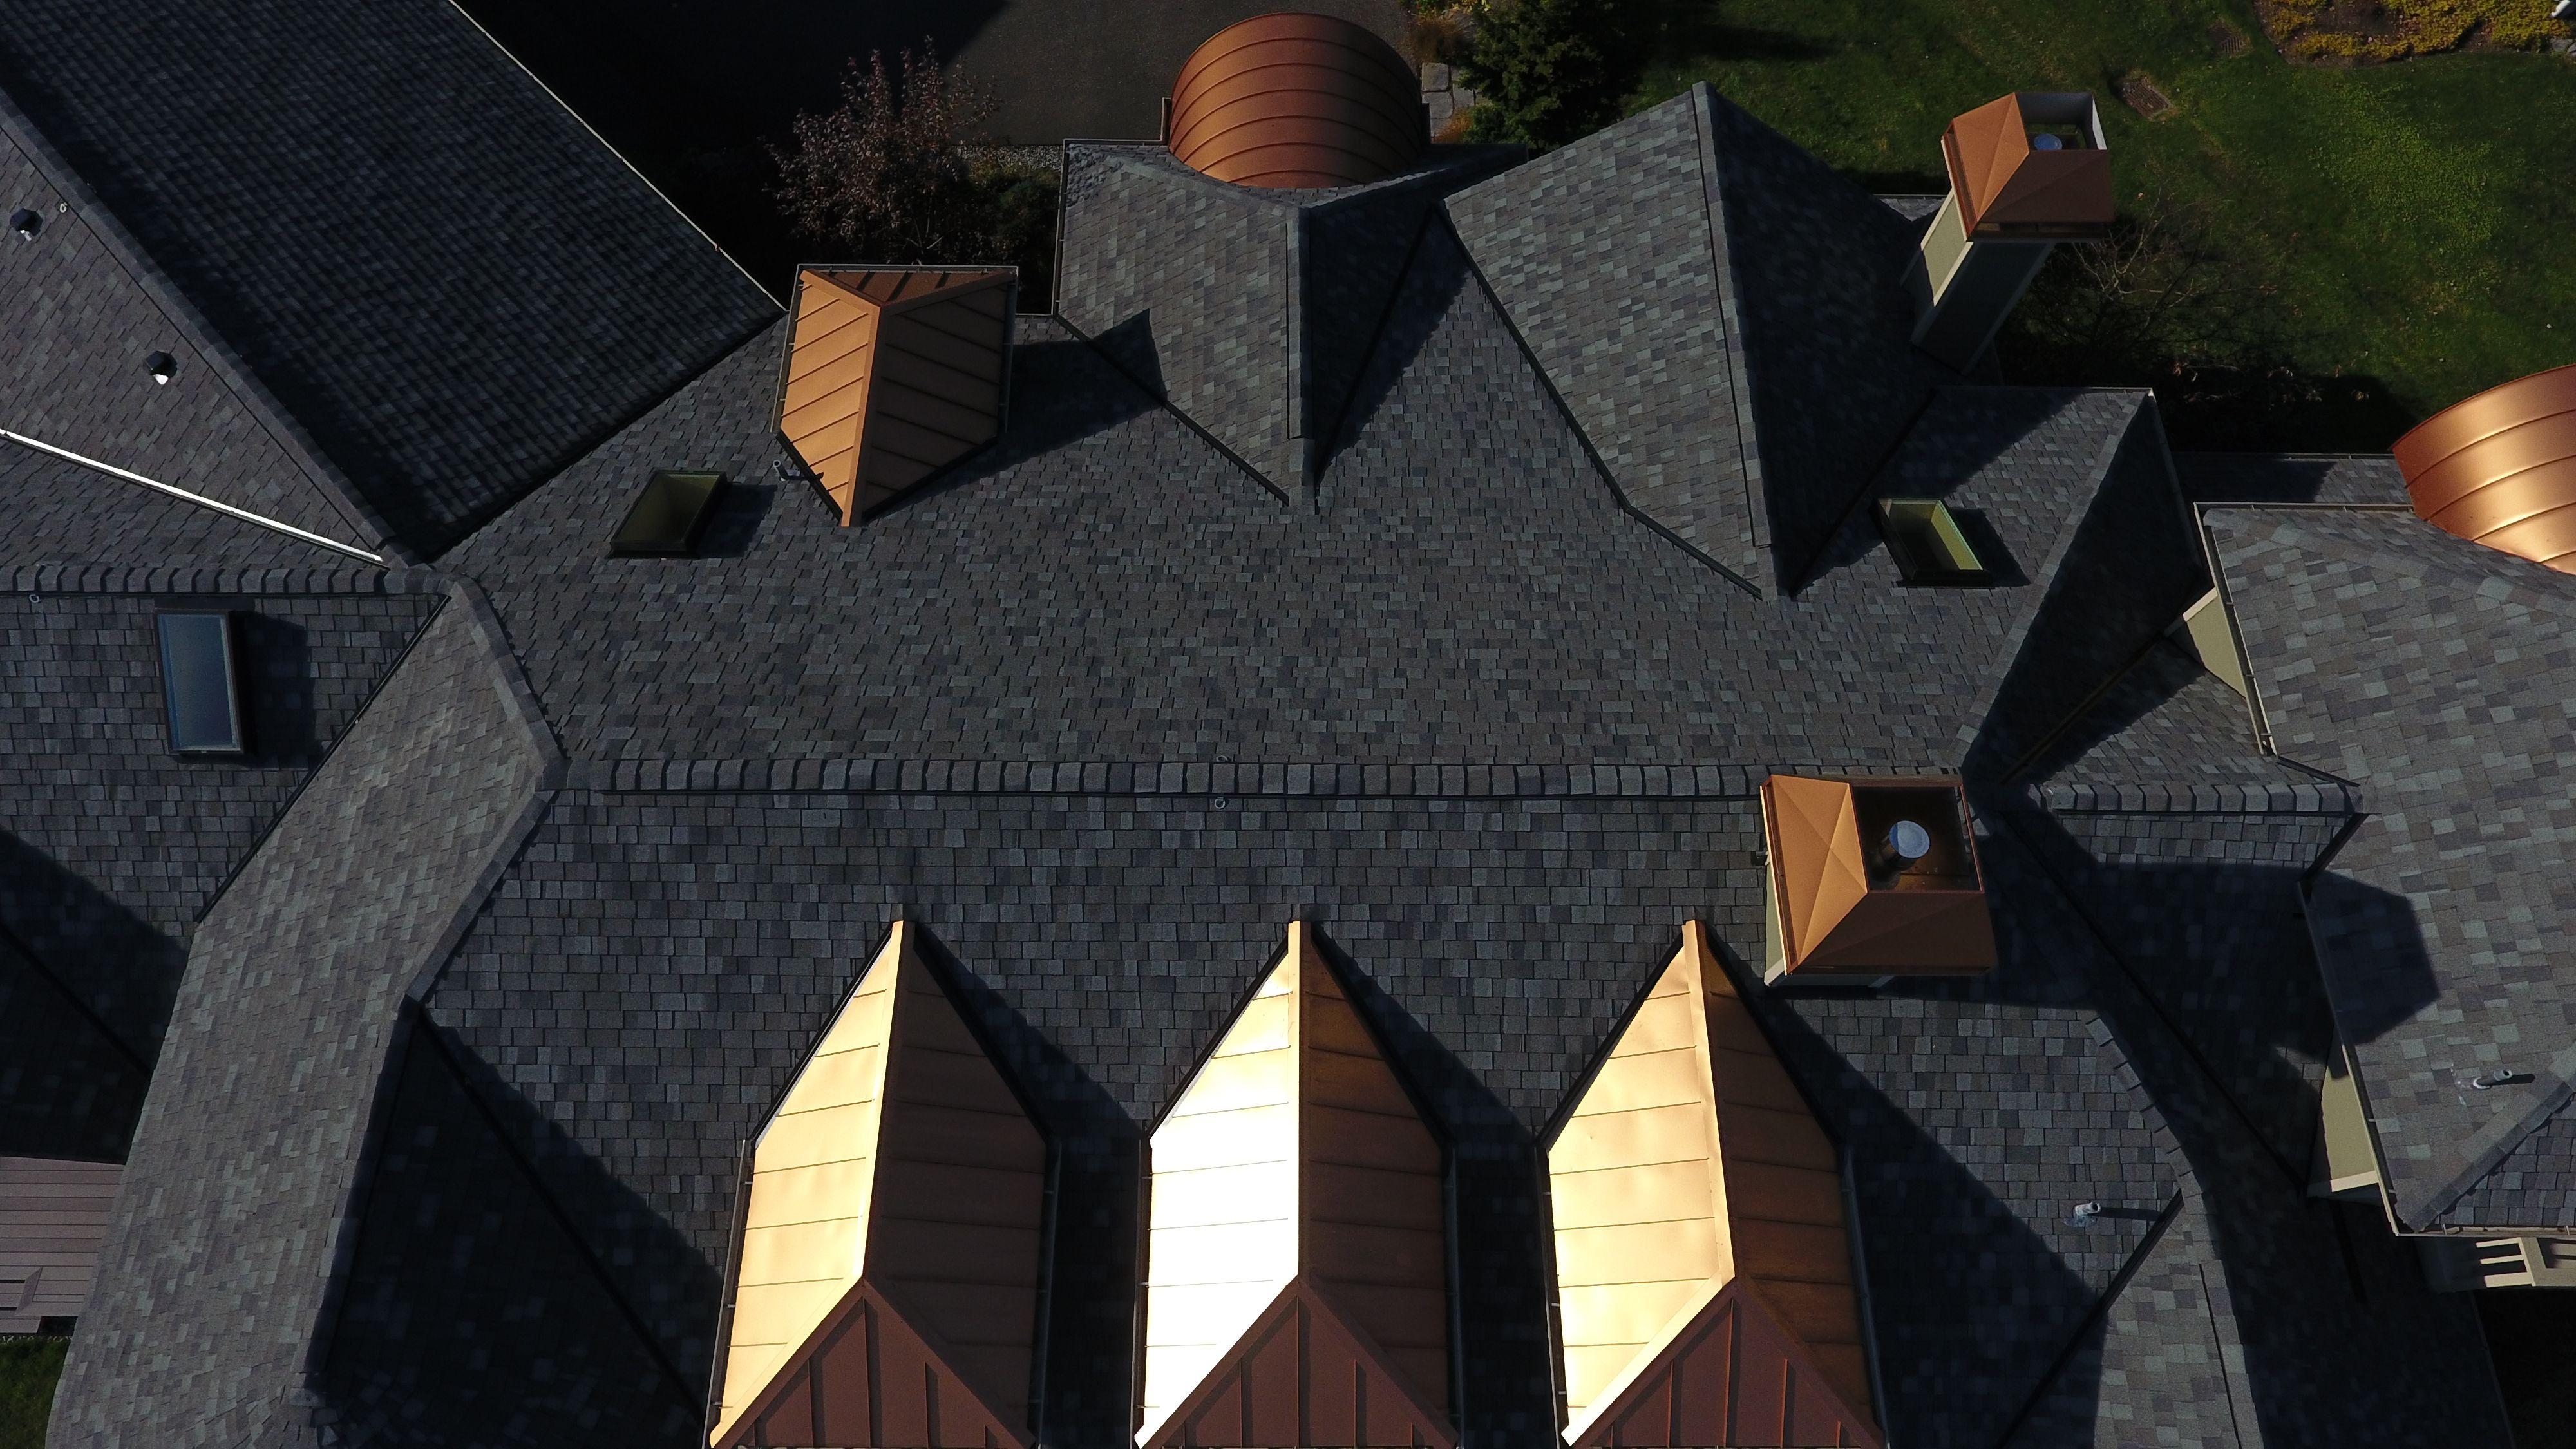 Hanley Construction Bainbridge Island Wa Roof Repair Bainbridge Island Roofing Contractors